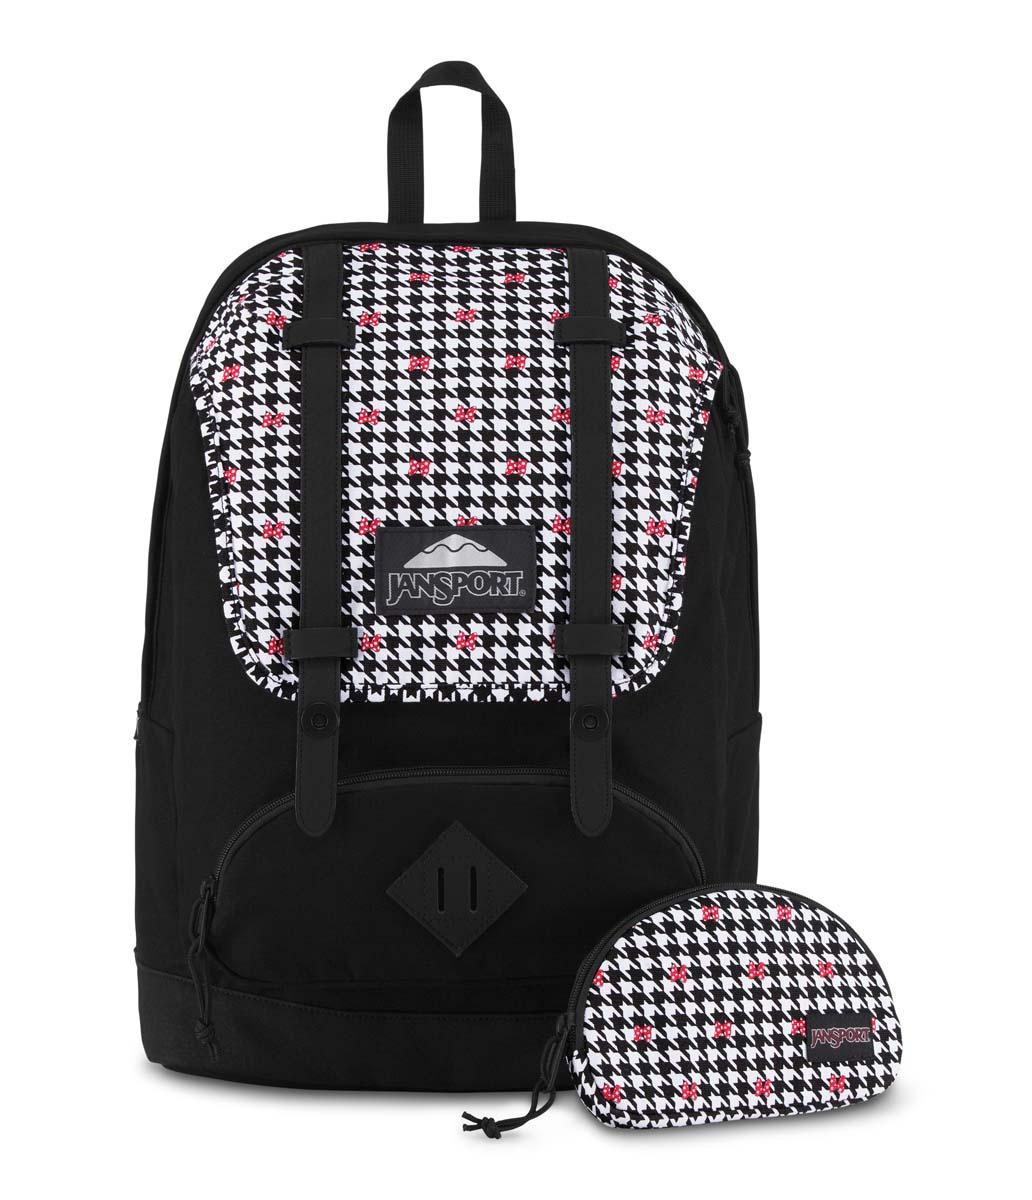 JanSport กระเป๋าเป้ รุ่น Baughman - Disney Minnie White Houndstooth